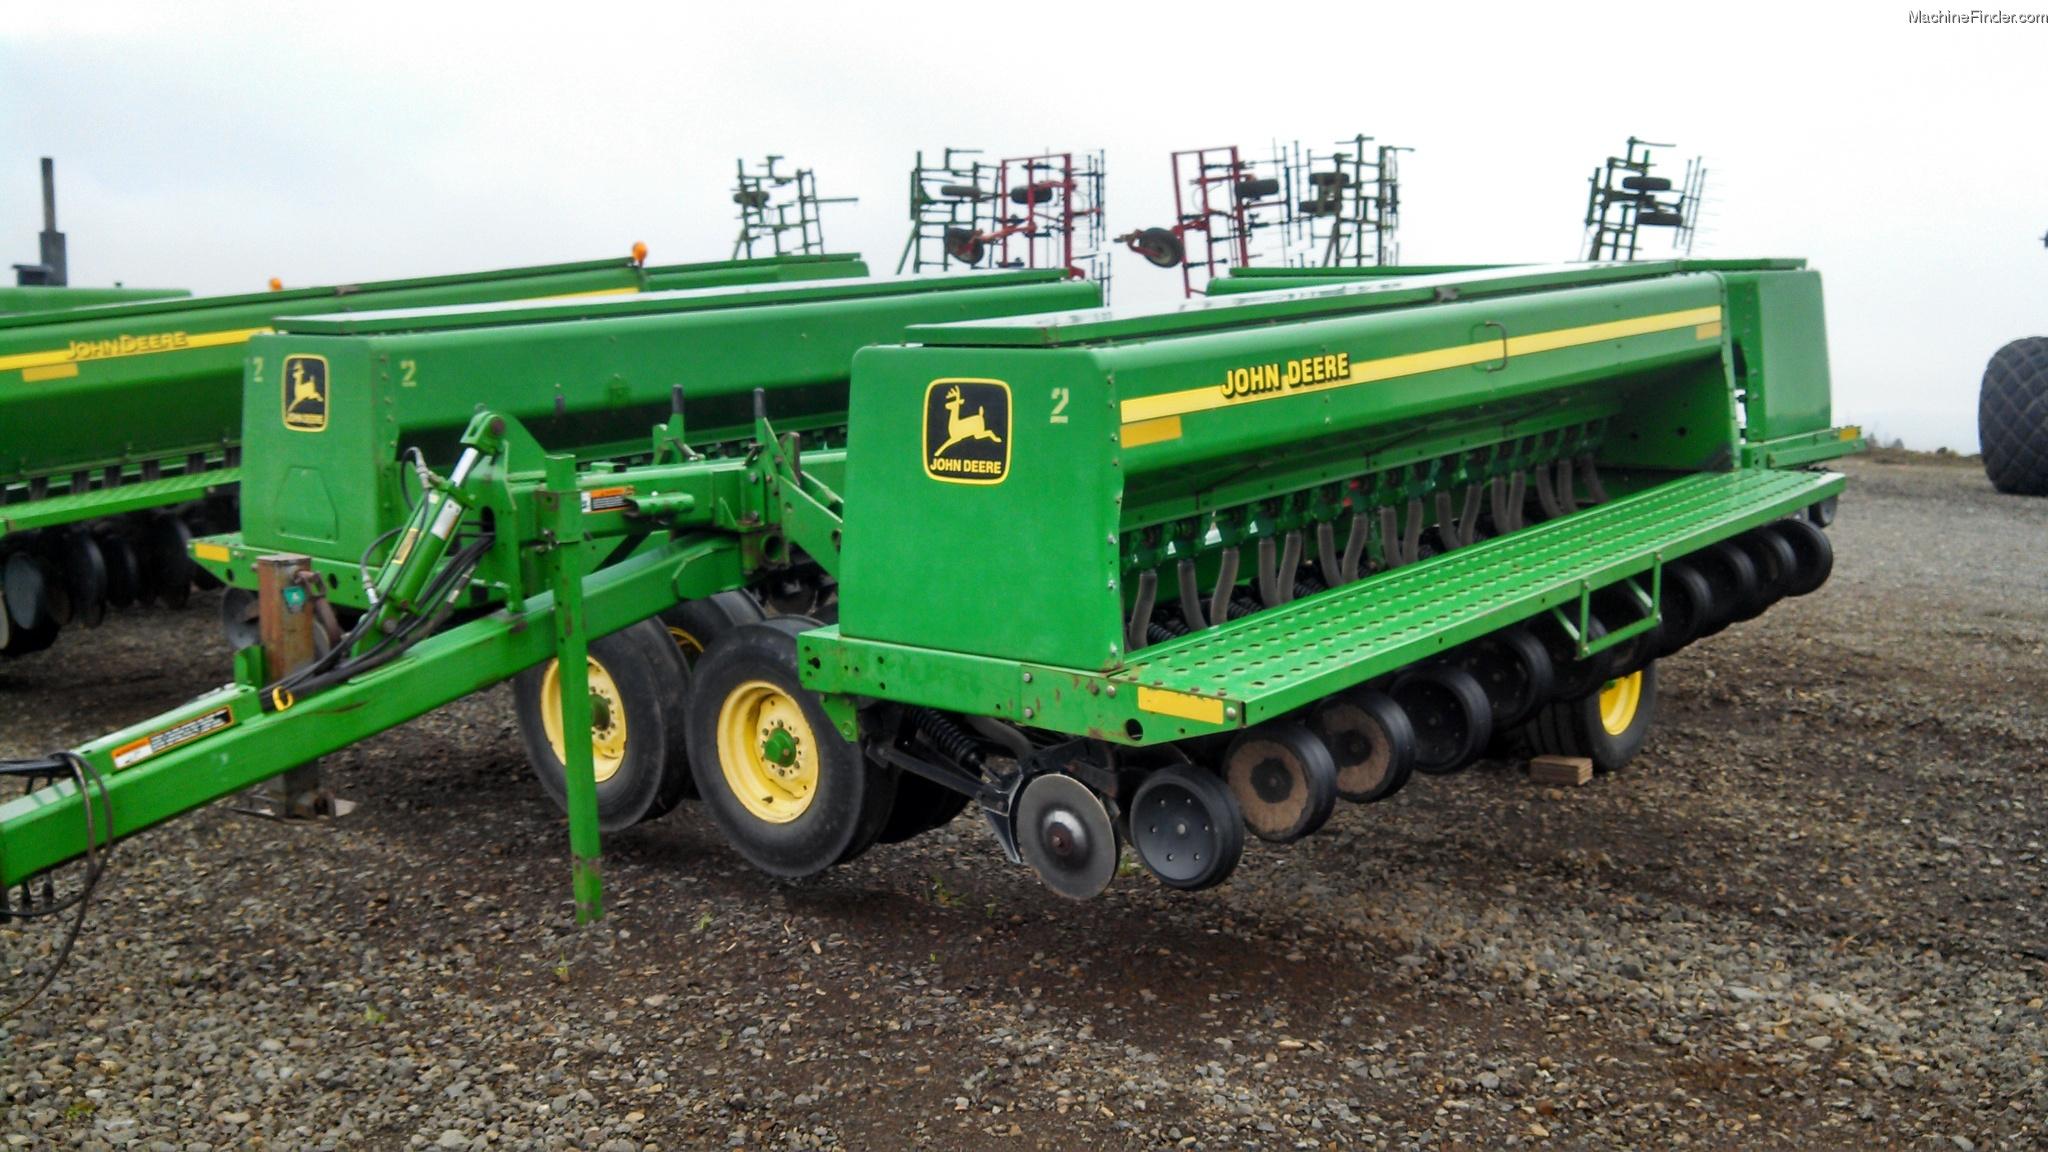 1999 John Deere 455 Planting & Seeding - Box Drills - John ...